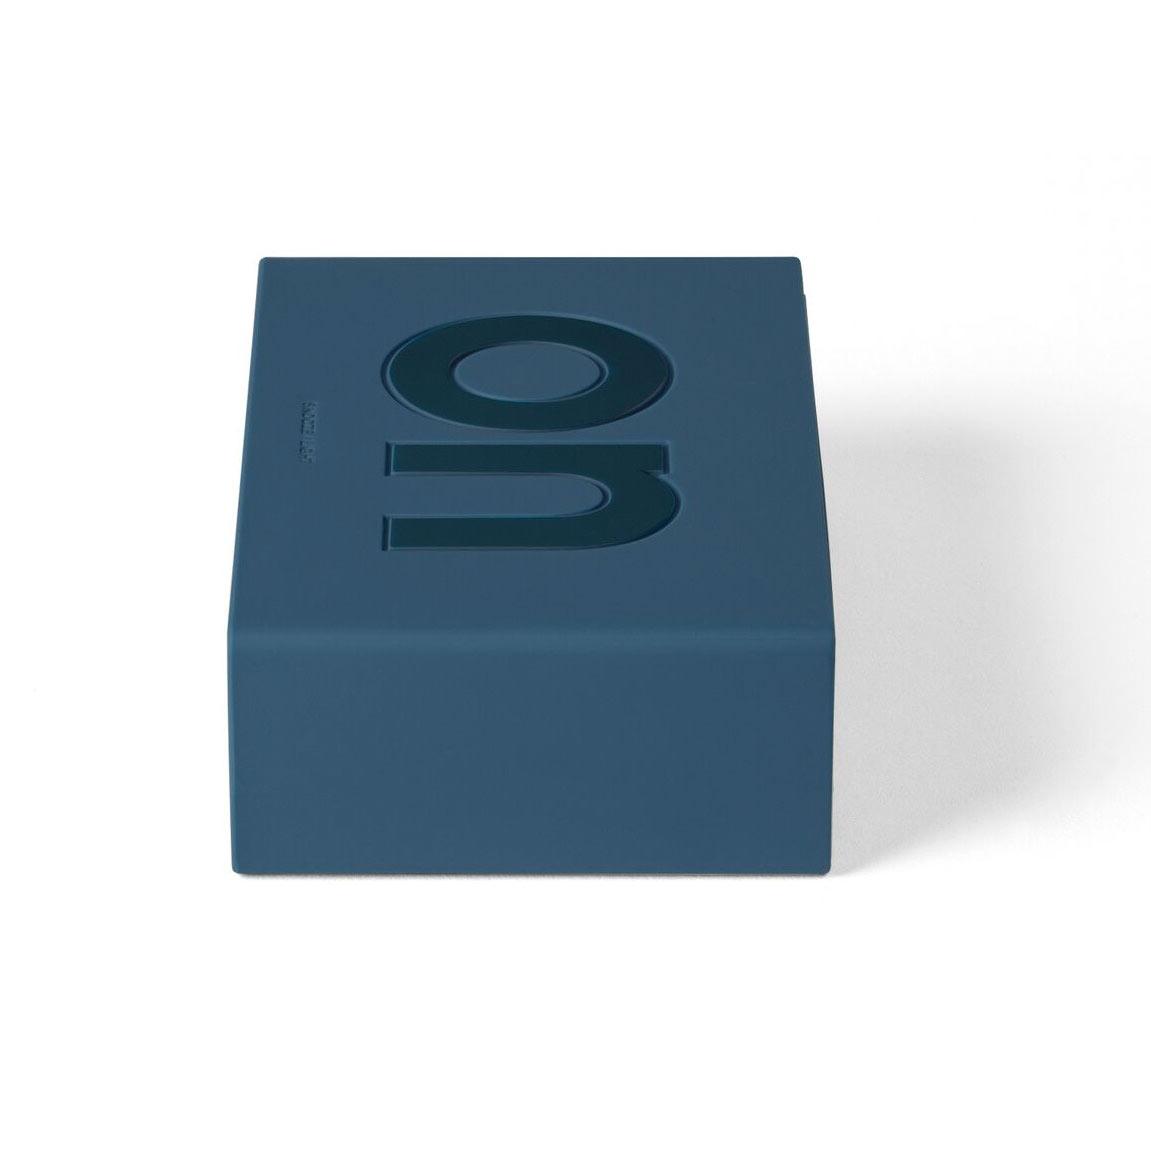 LEXON Flip LCD alarm clock LR130BF7 dark blue | The Design Gift Shop